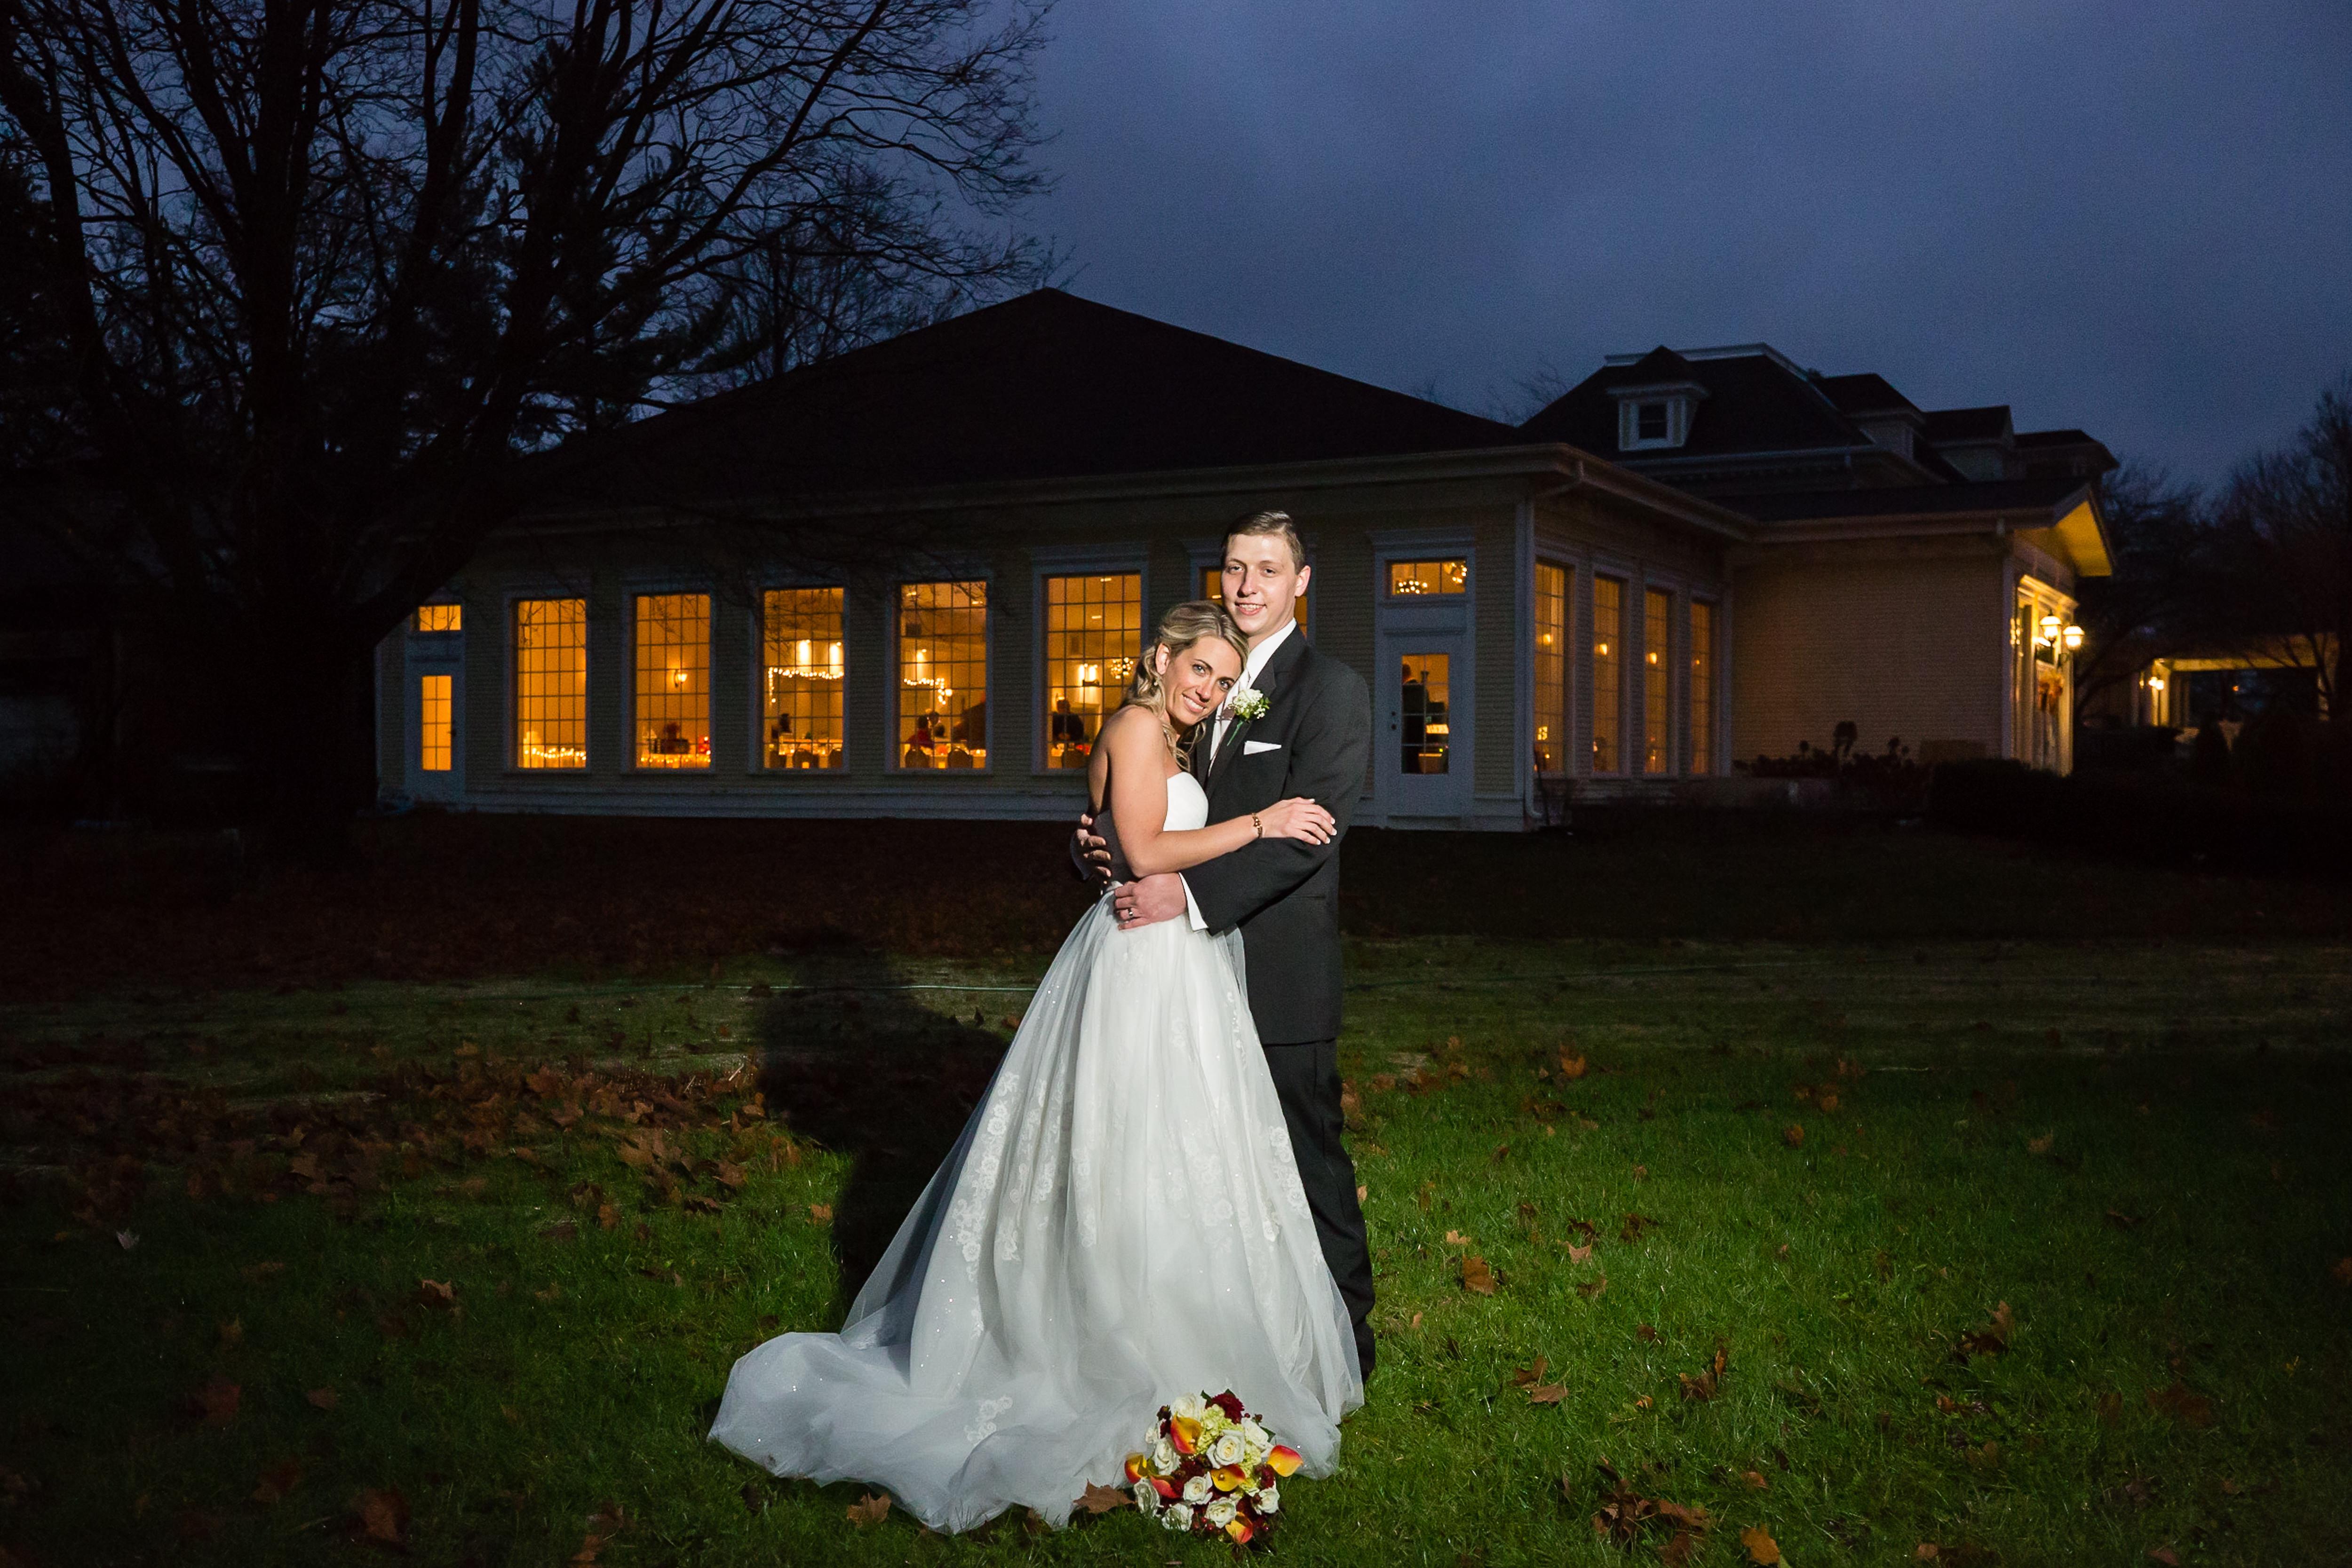 Angela Dylan Dwight Wedding Il Wedding Photographer Award